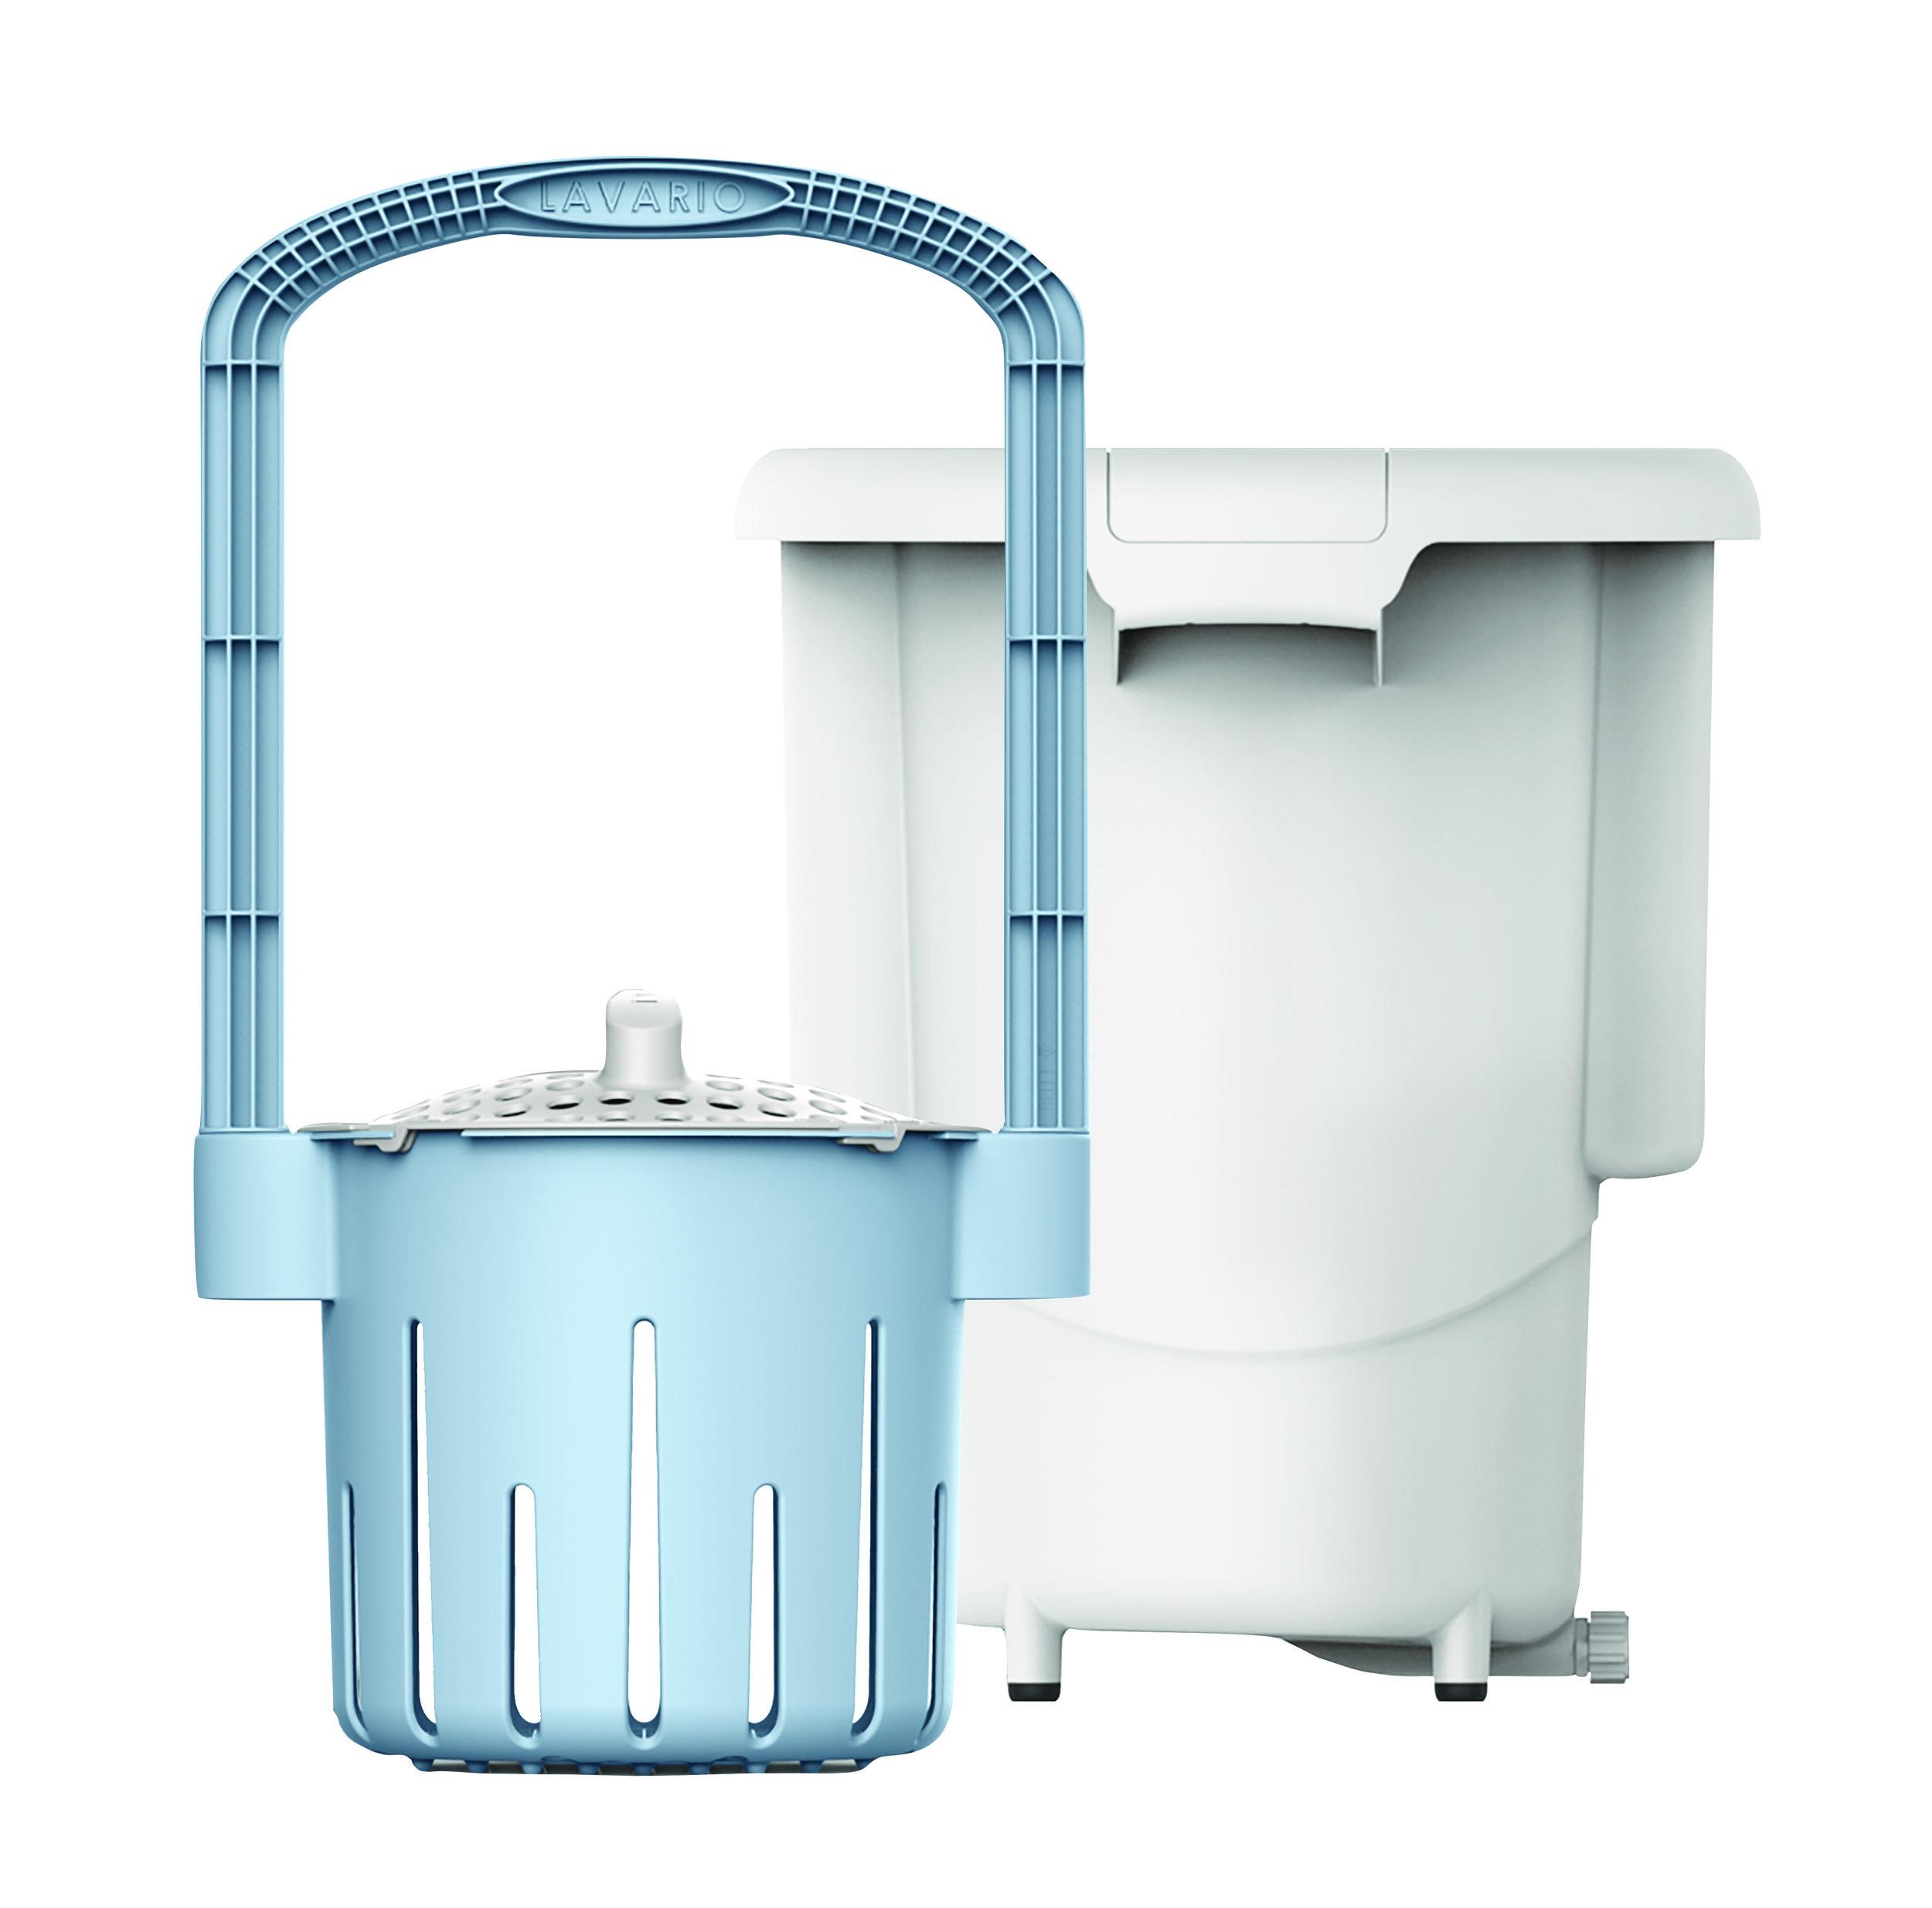 lavario_portable_washer